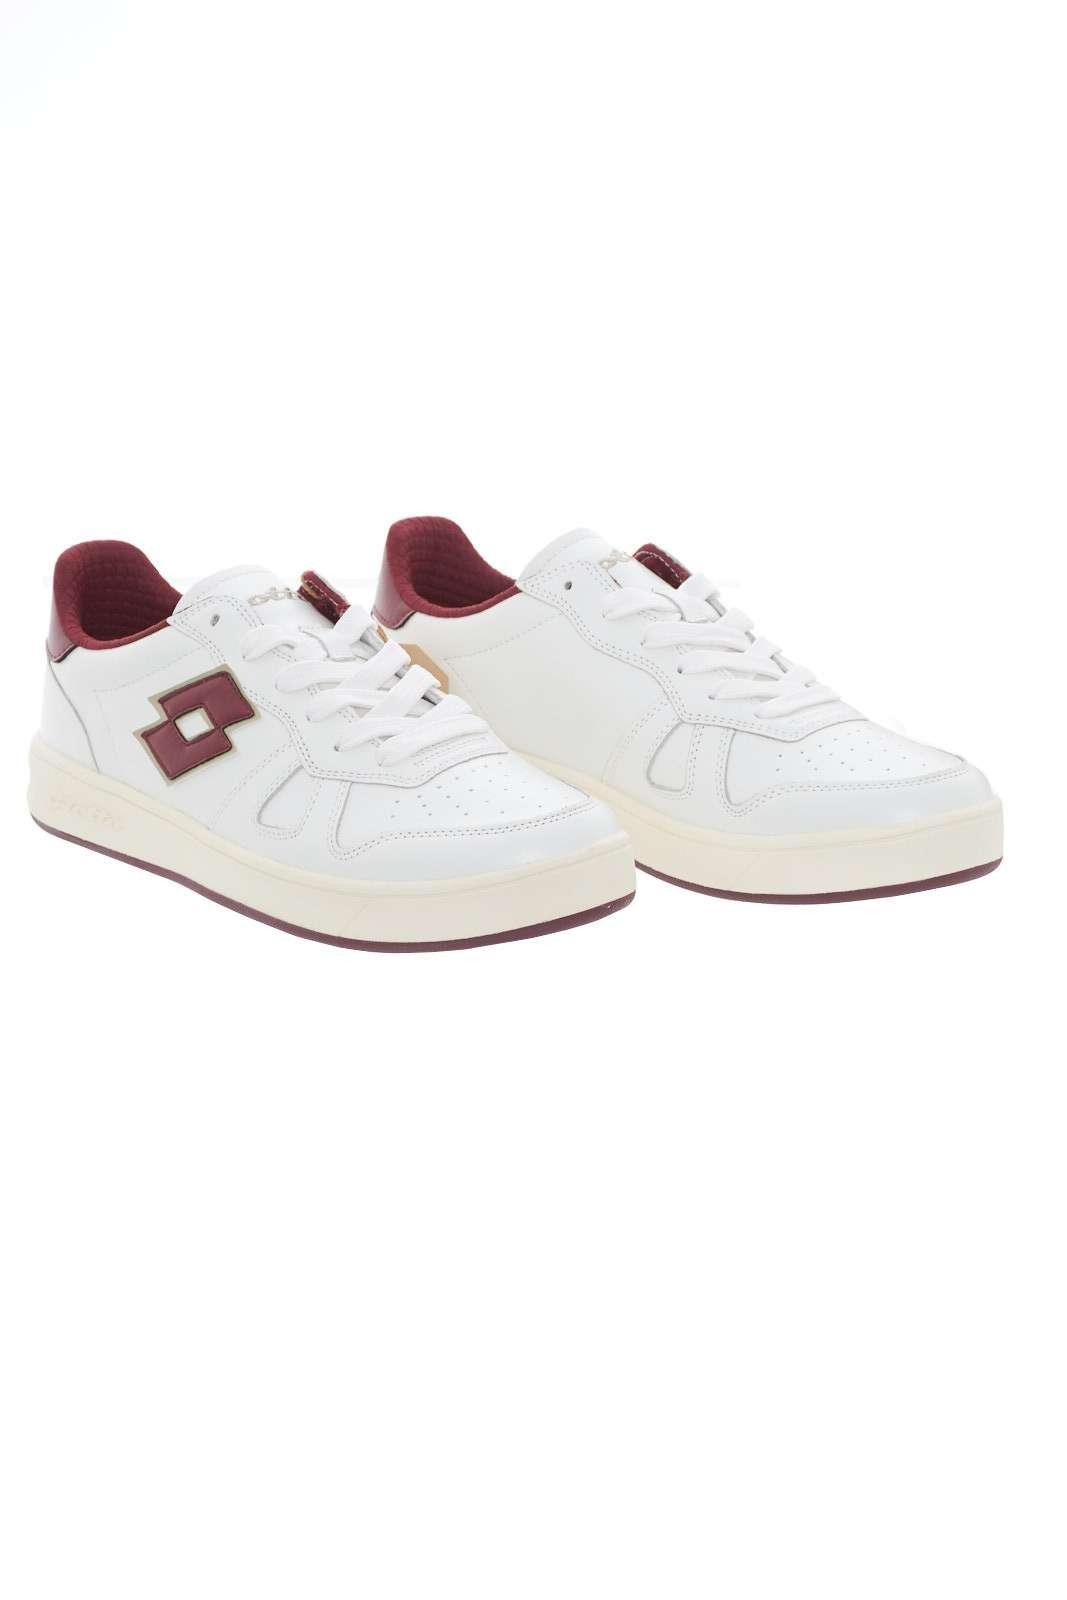 https://www.parmax.com/media/catalog/product/a/i/ai-outlet_parmax-sneaker-lotto-t7379-c_1.jpg